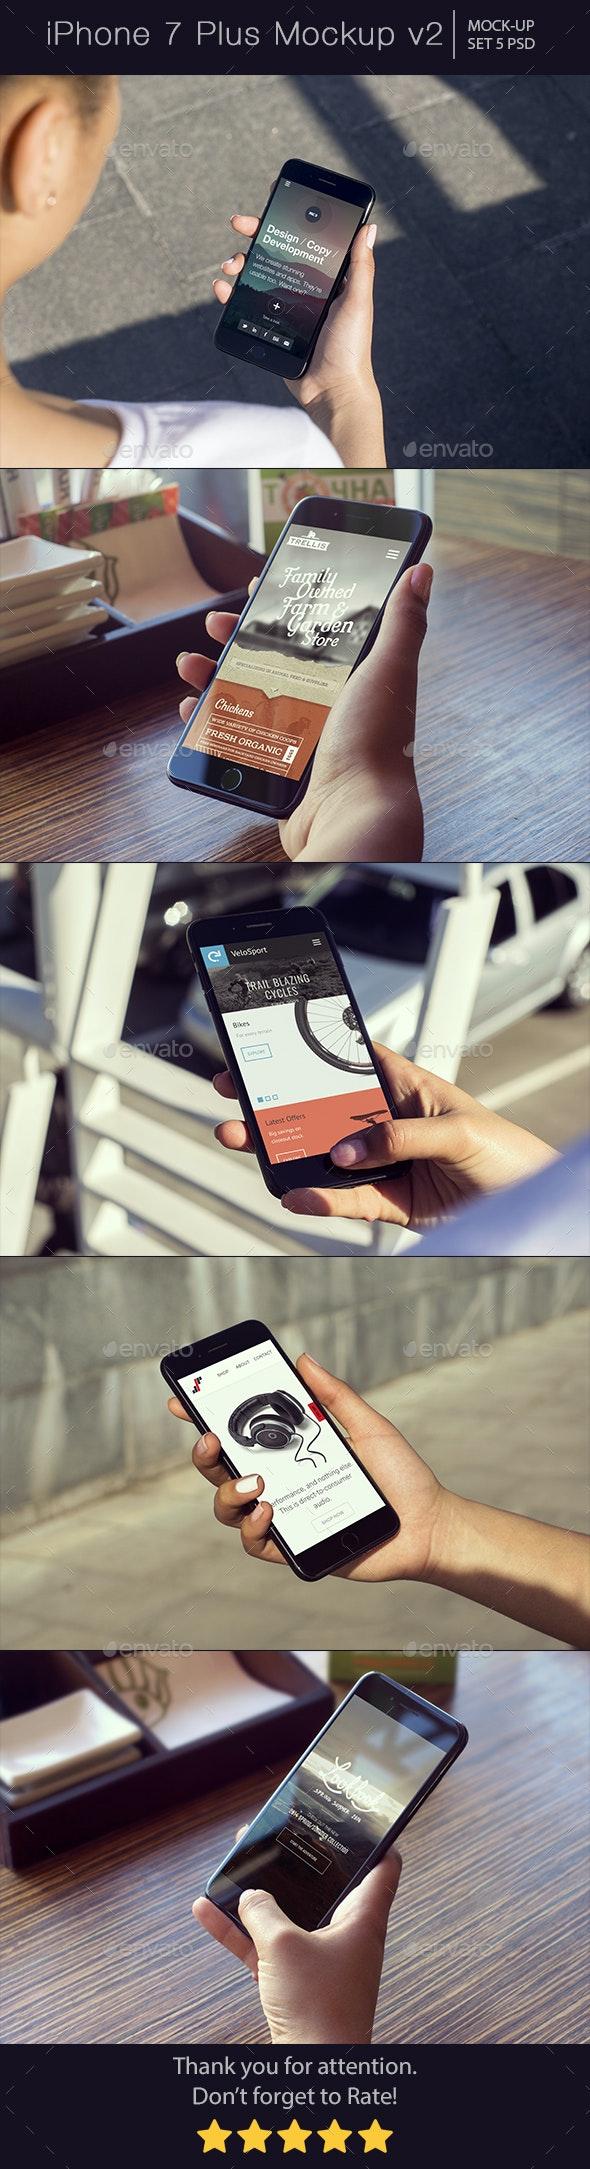 iPhone 7 Plus Mockup v2 - Mobile Displays